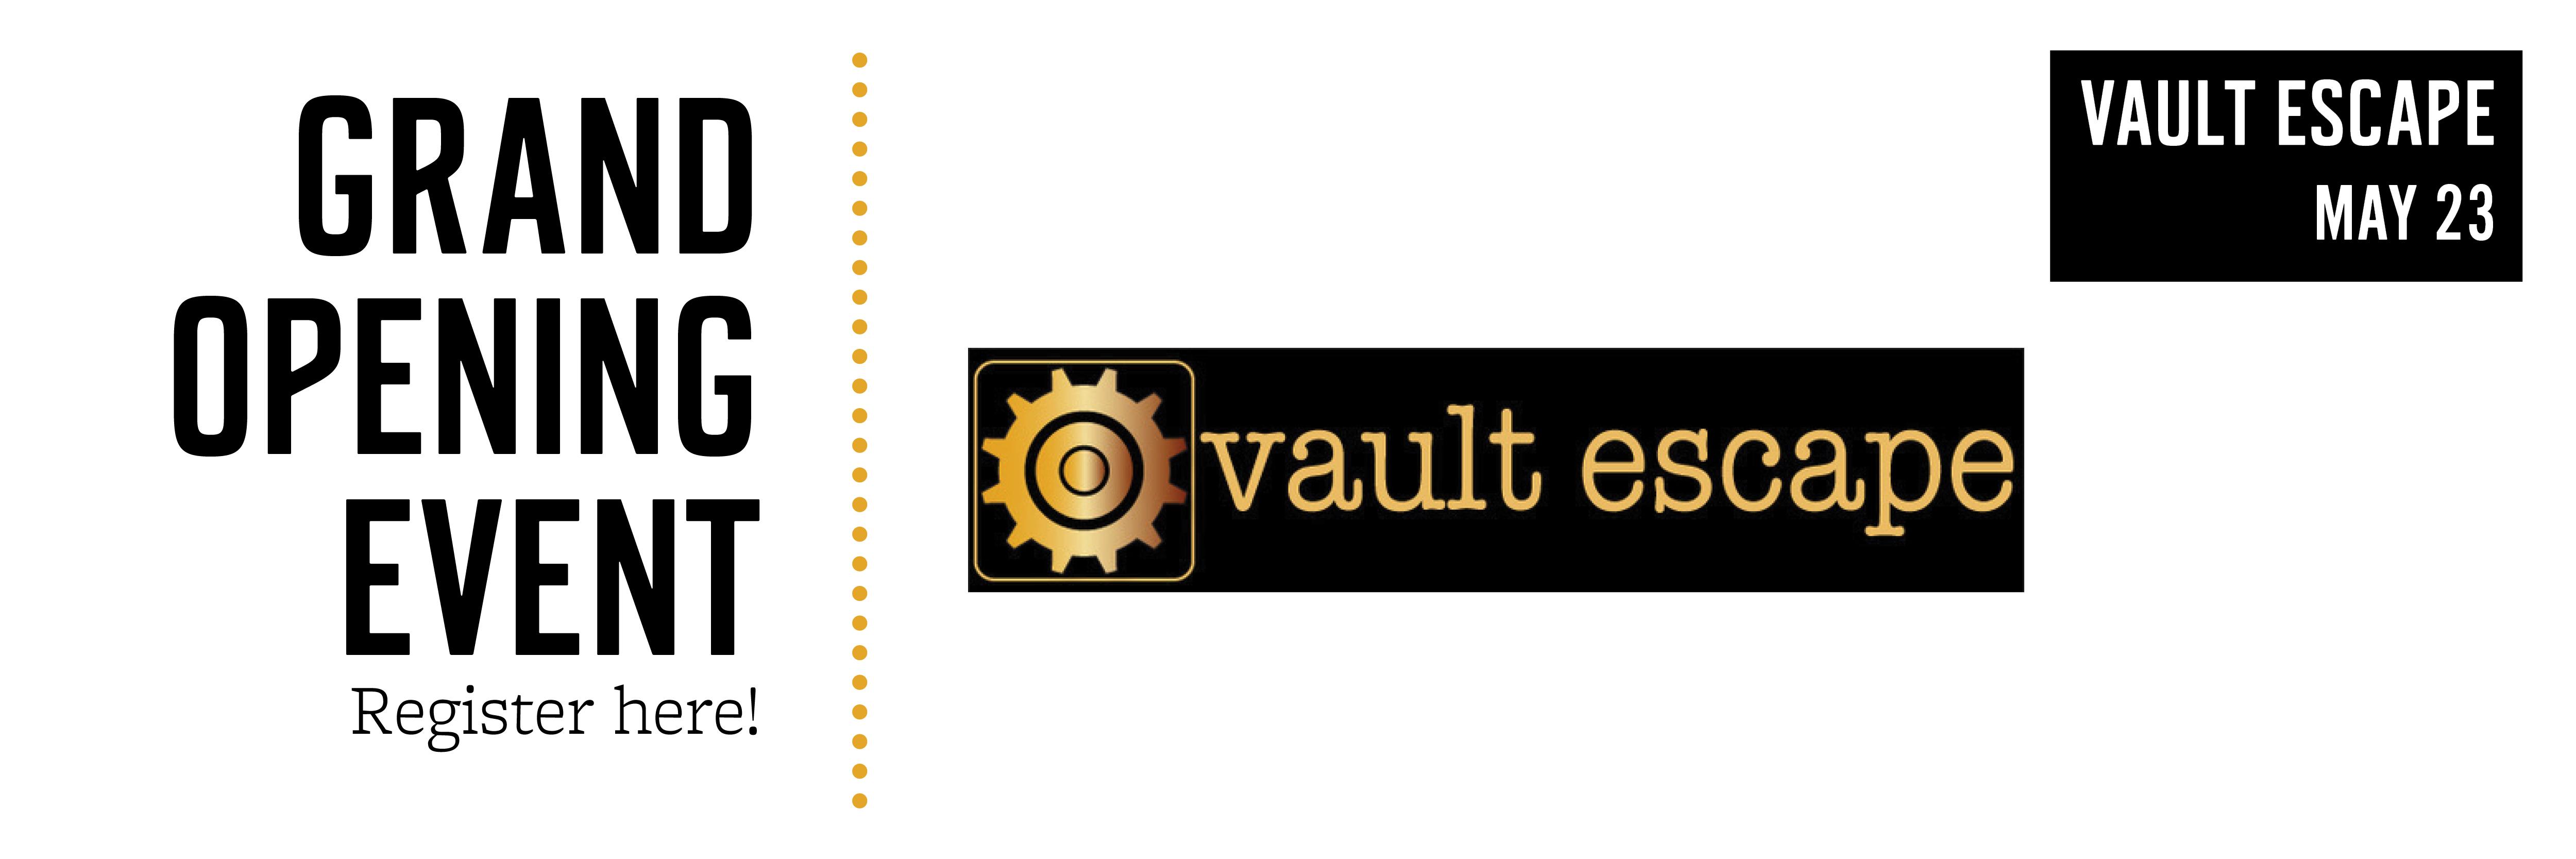 vaultescape_go.jpg